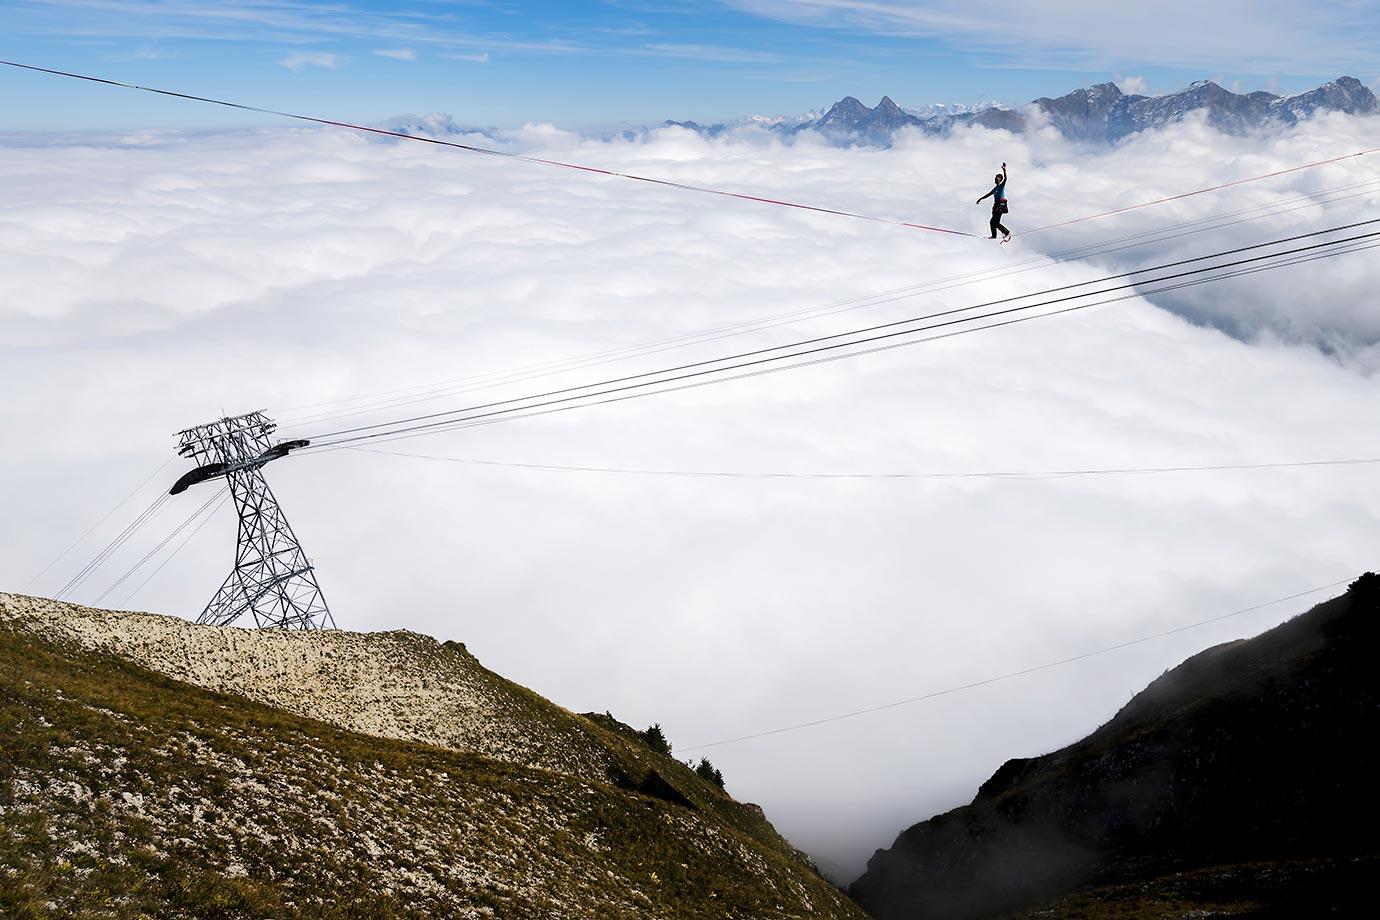 Nicolas Rebert walks on the line during the Highline Extreme event in Moleson Peak, western Switzerland.